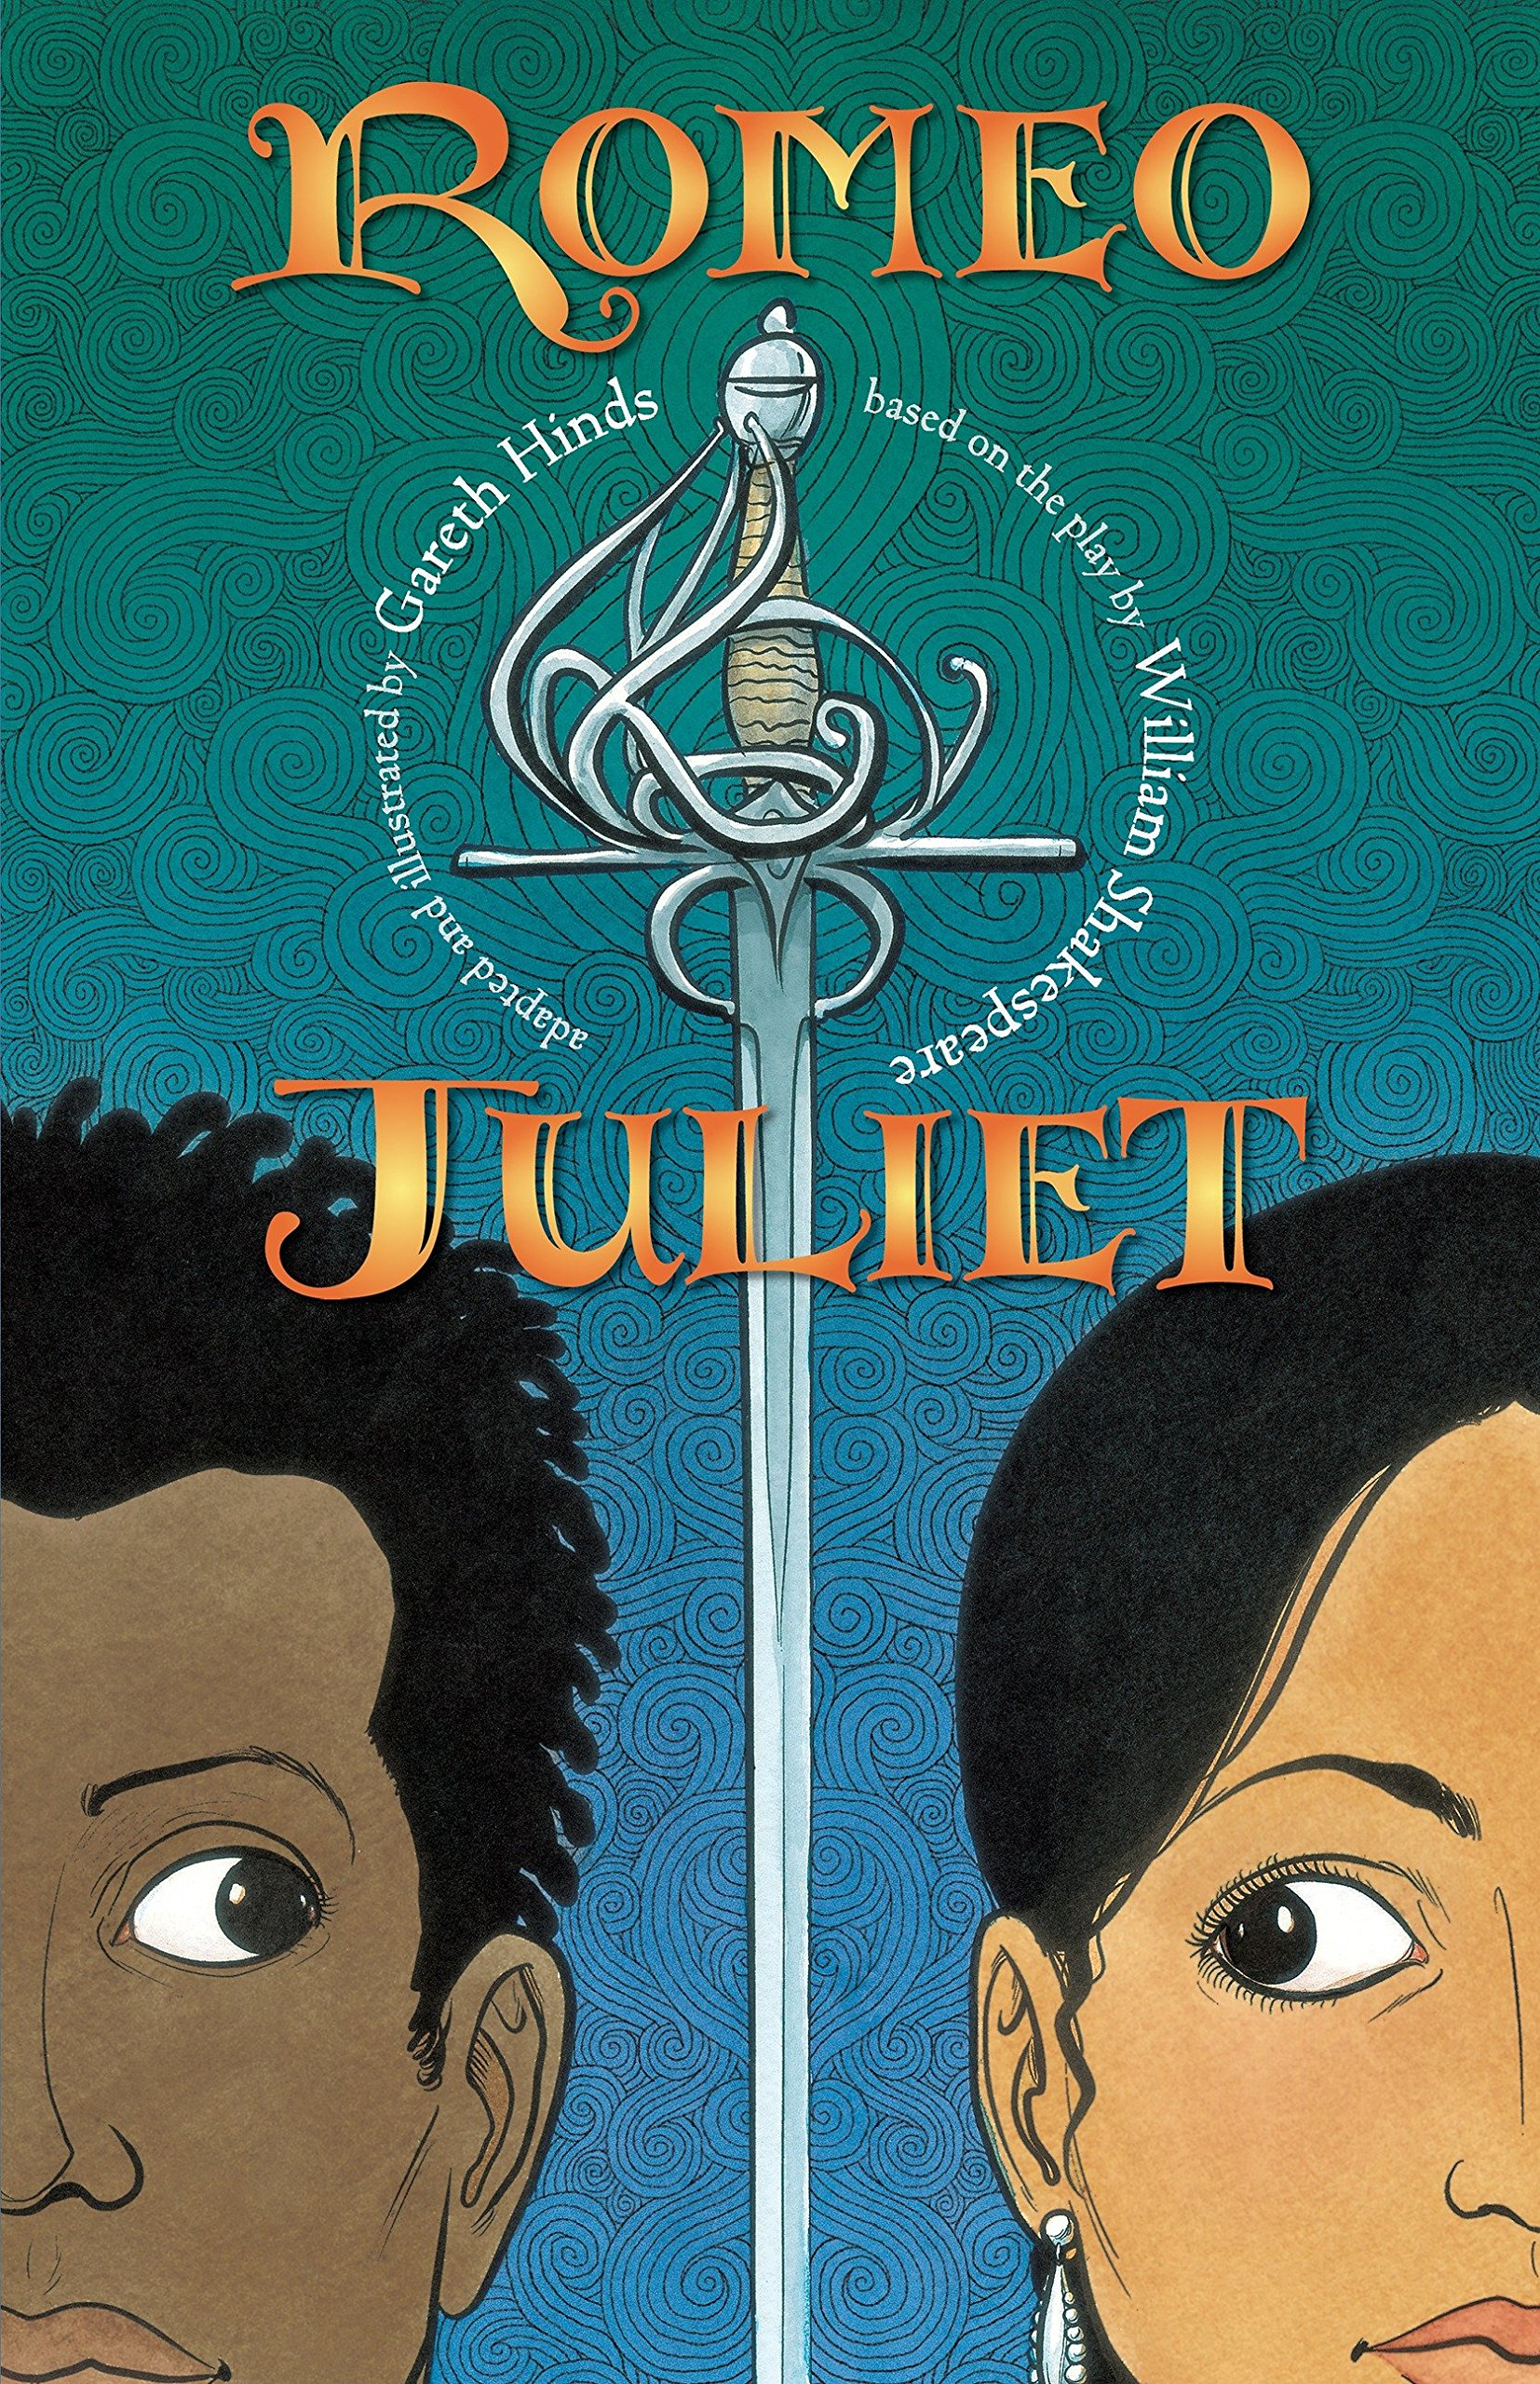 Amazon.com: Romeo and Juliet (Shakespeare Classics Graphic Novels)  (9780763659486): Hinds, Gareth, Hinds, Gareth: Books